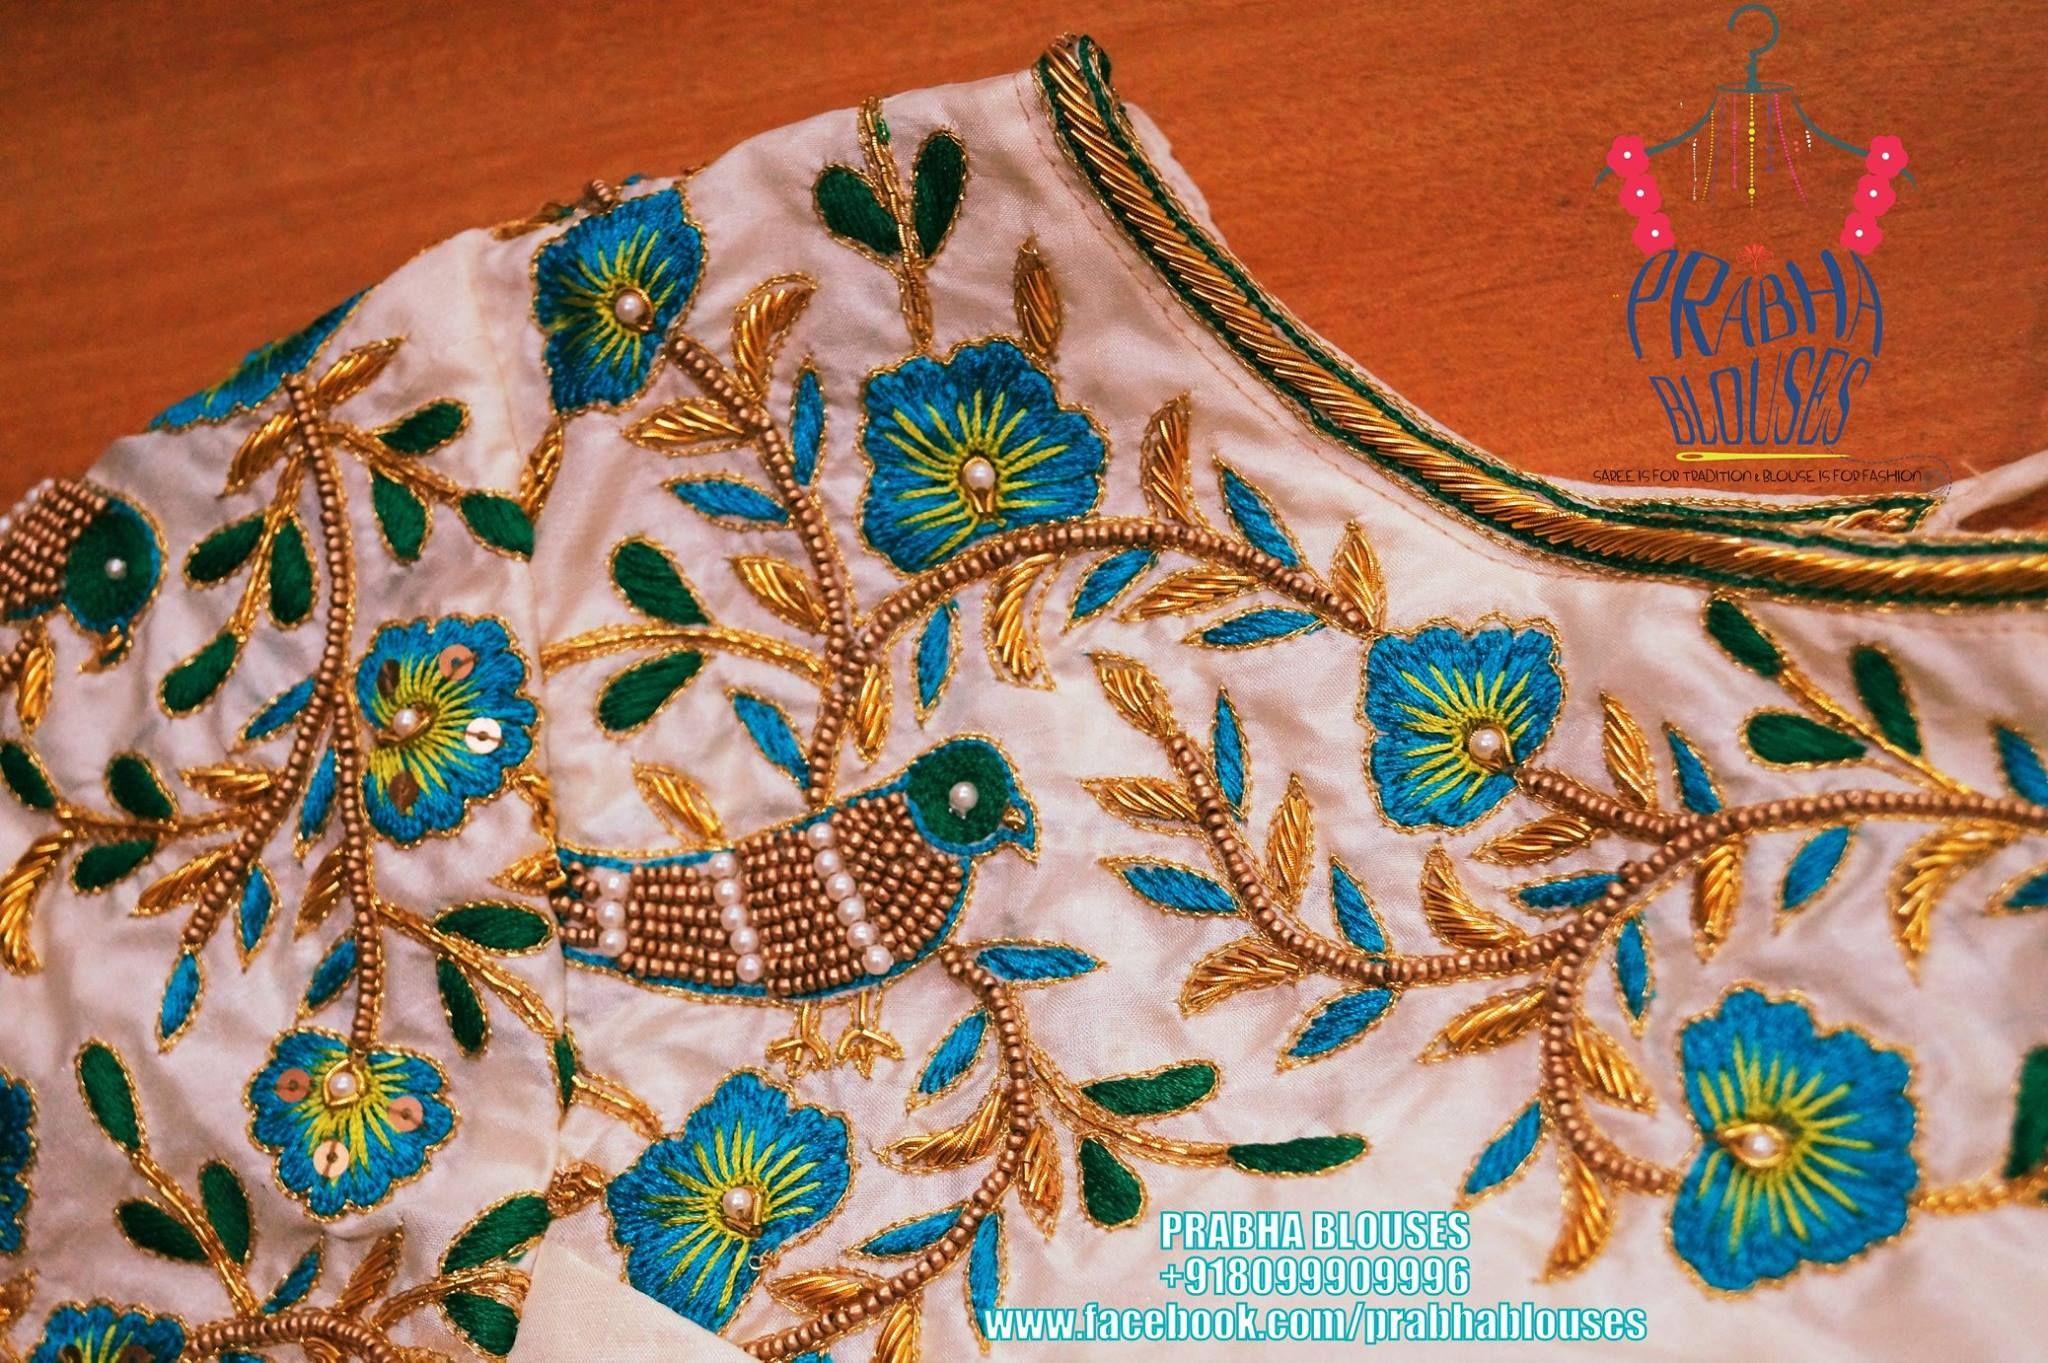 64e95bc9a6 Prabha blouses. Hyderabad. 12-6-211/3 viveknagar kukatpally. Contact :  080999 09996. Email : prabha.blouses@gmail.com.